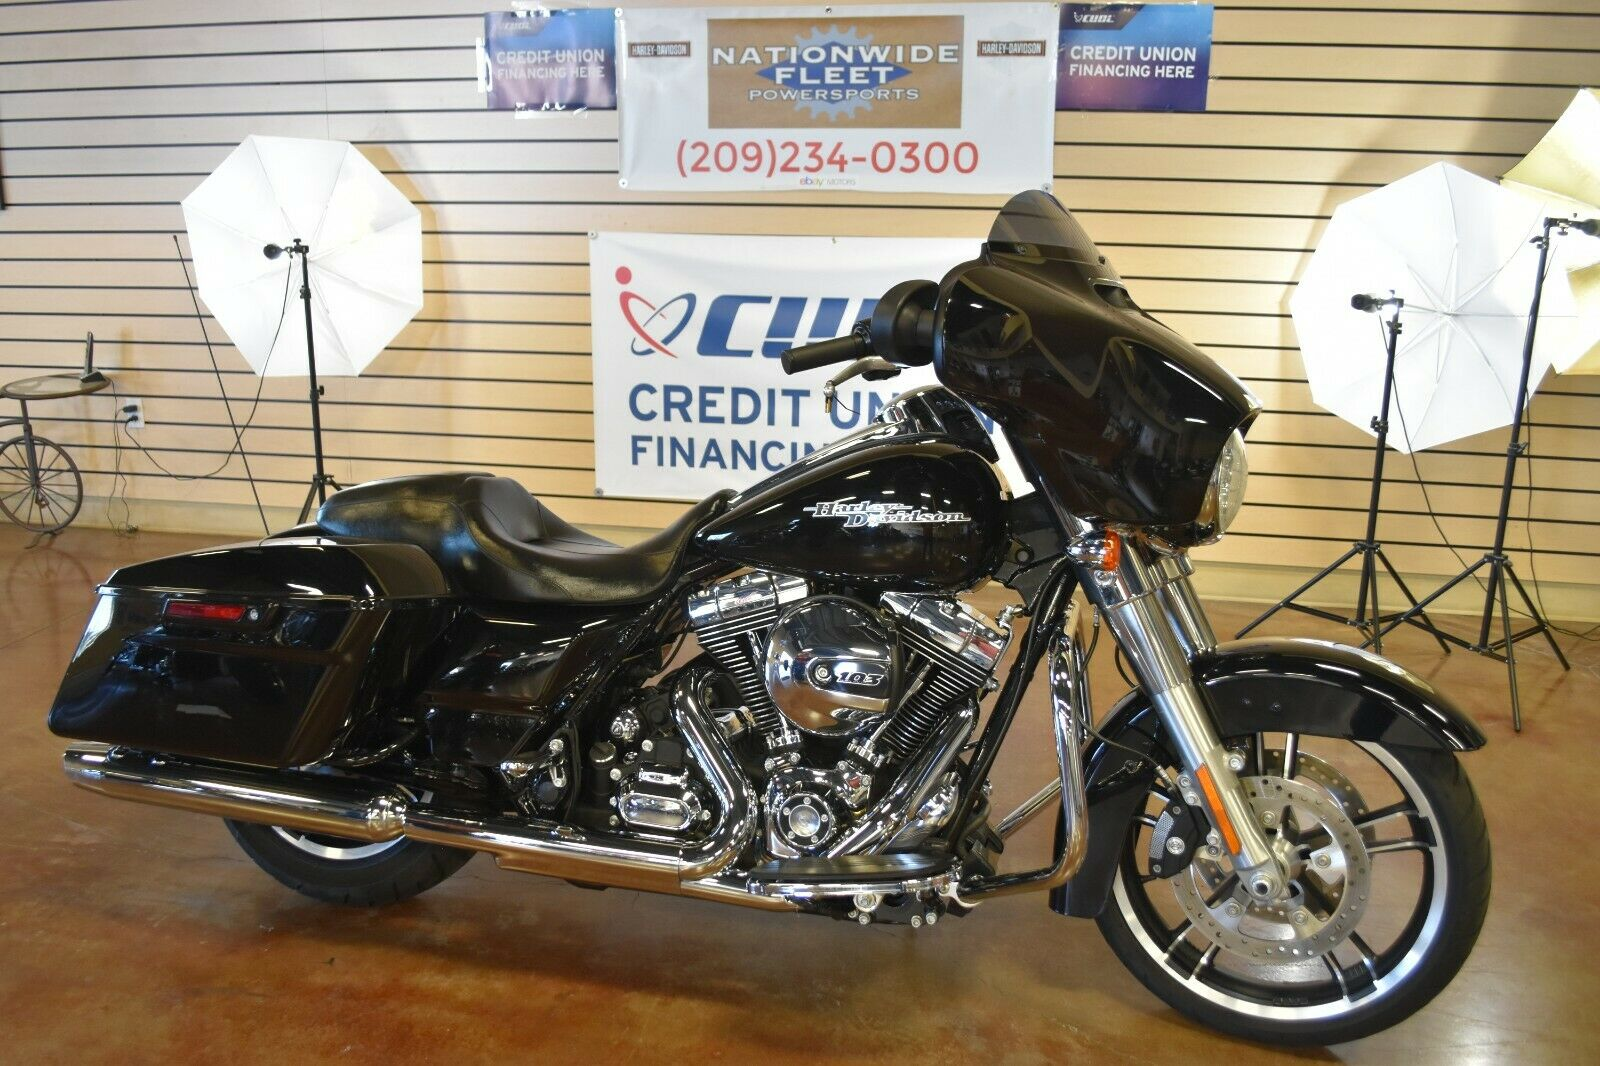 2016 Harley Davidson Street Glide FLHX 103 Touring 8k Miles Clean NO RESERVE